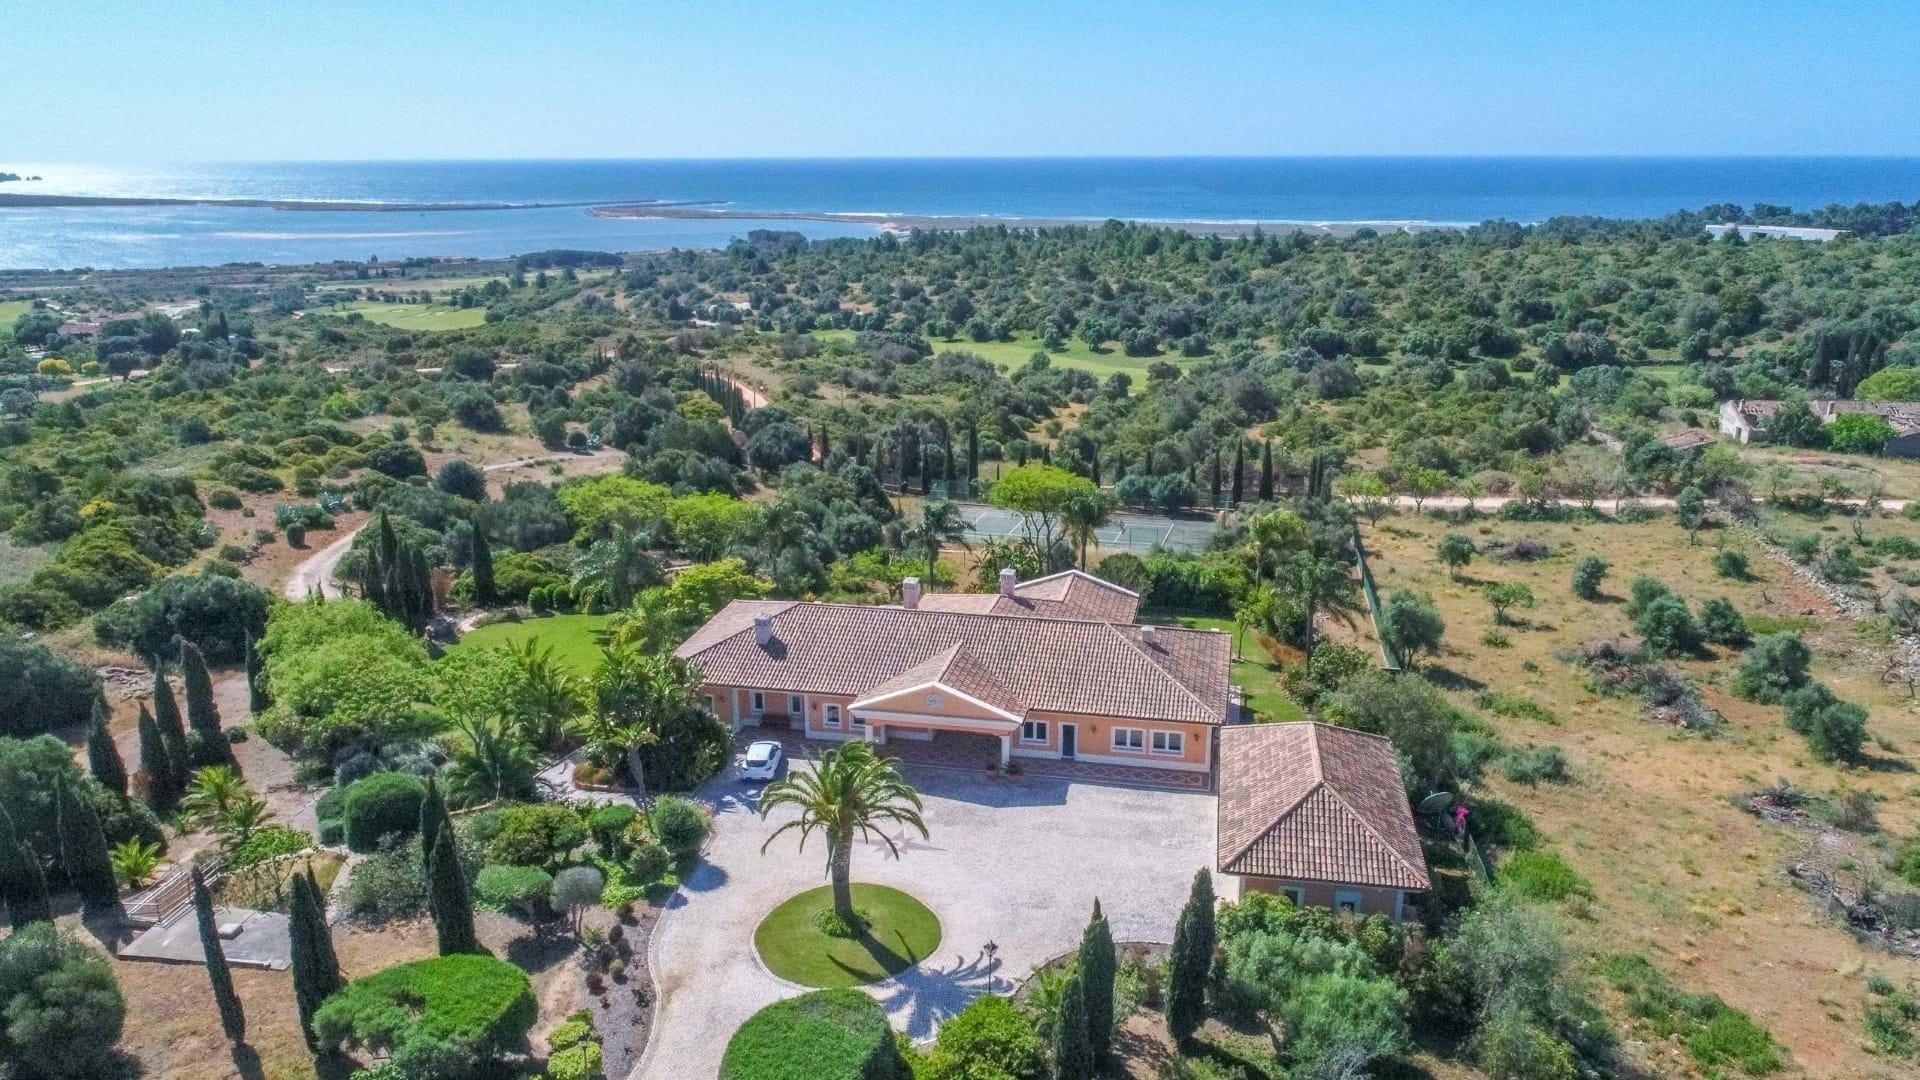 Villa in Lagos, Algarve, Portugal 1 - 10671128